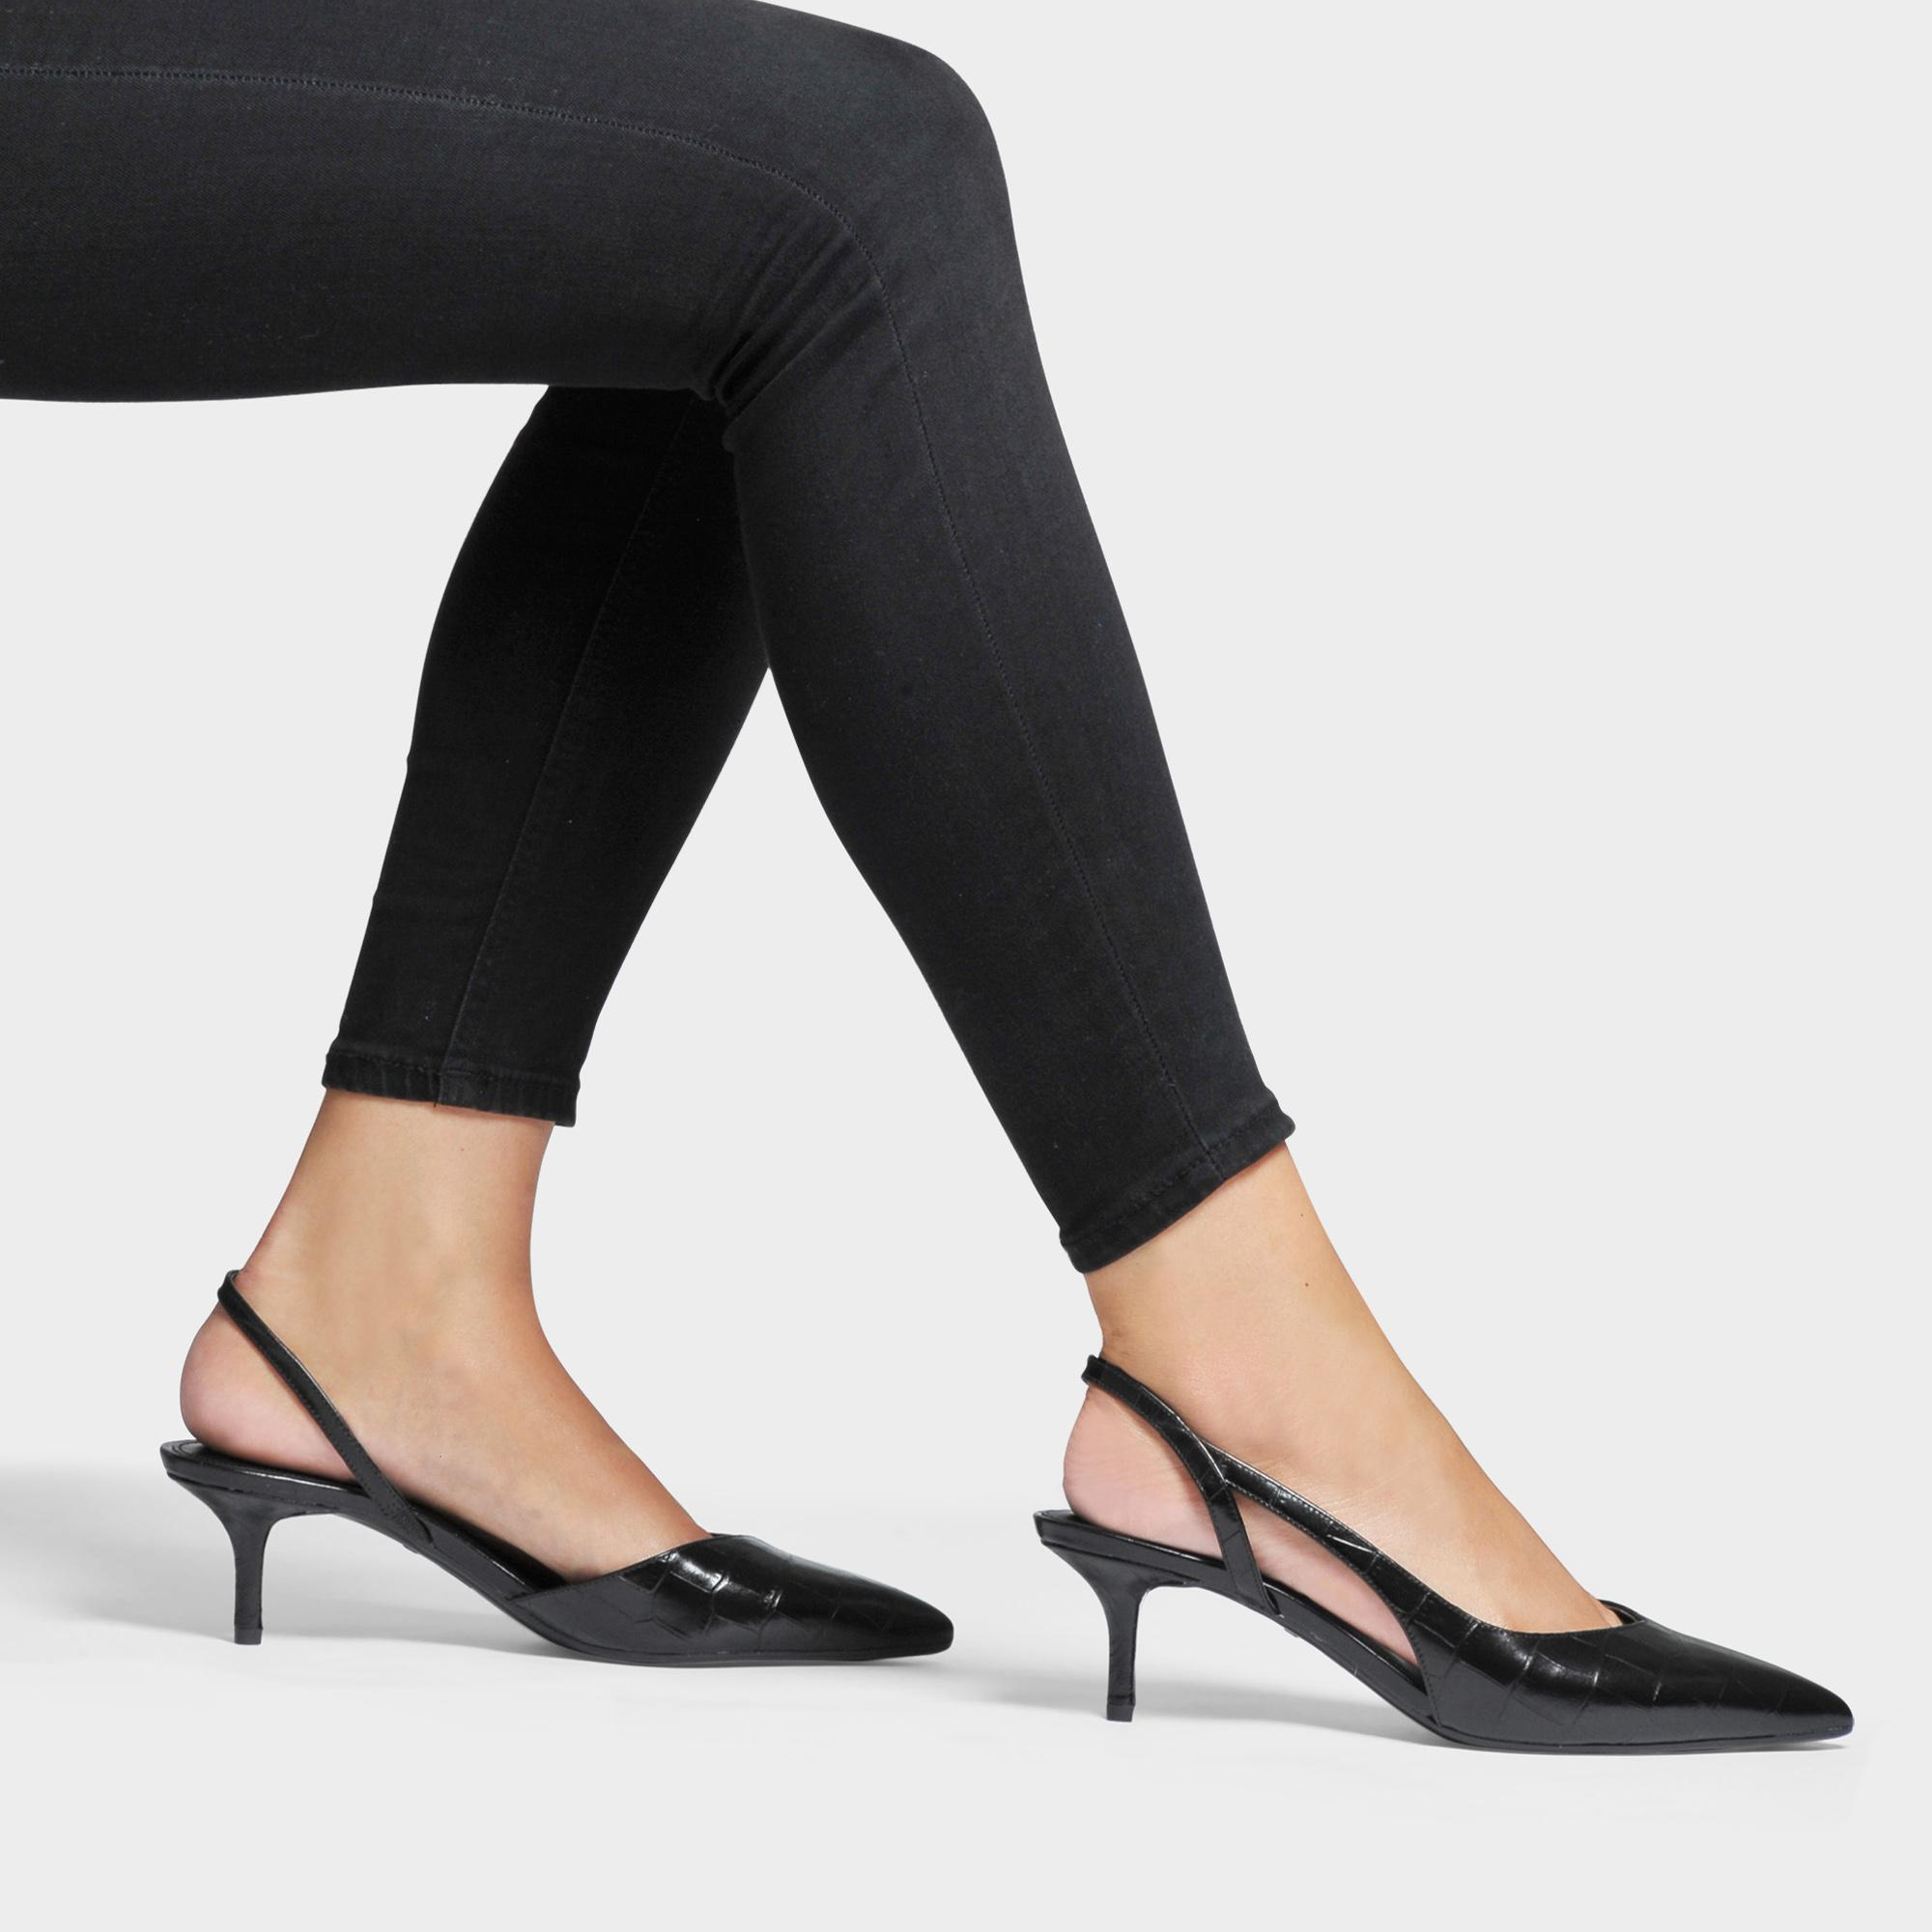 68722ca26cc Lyst - MICHAEL Michael Kors Eliza Kitten Pumps In Black Leather in Black